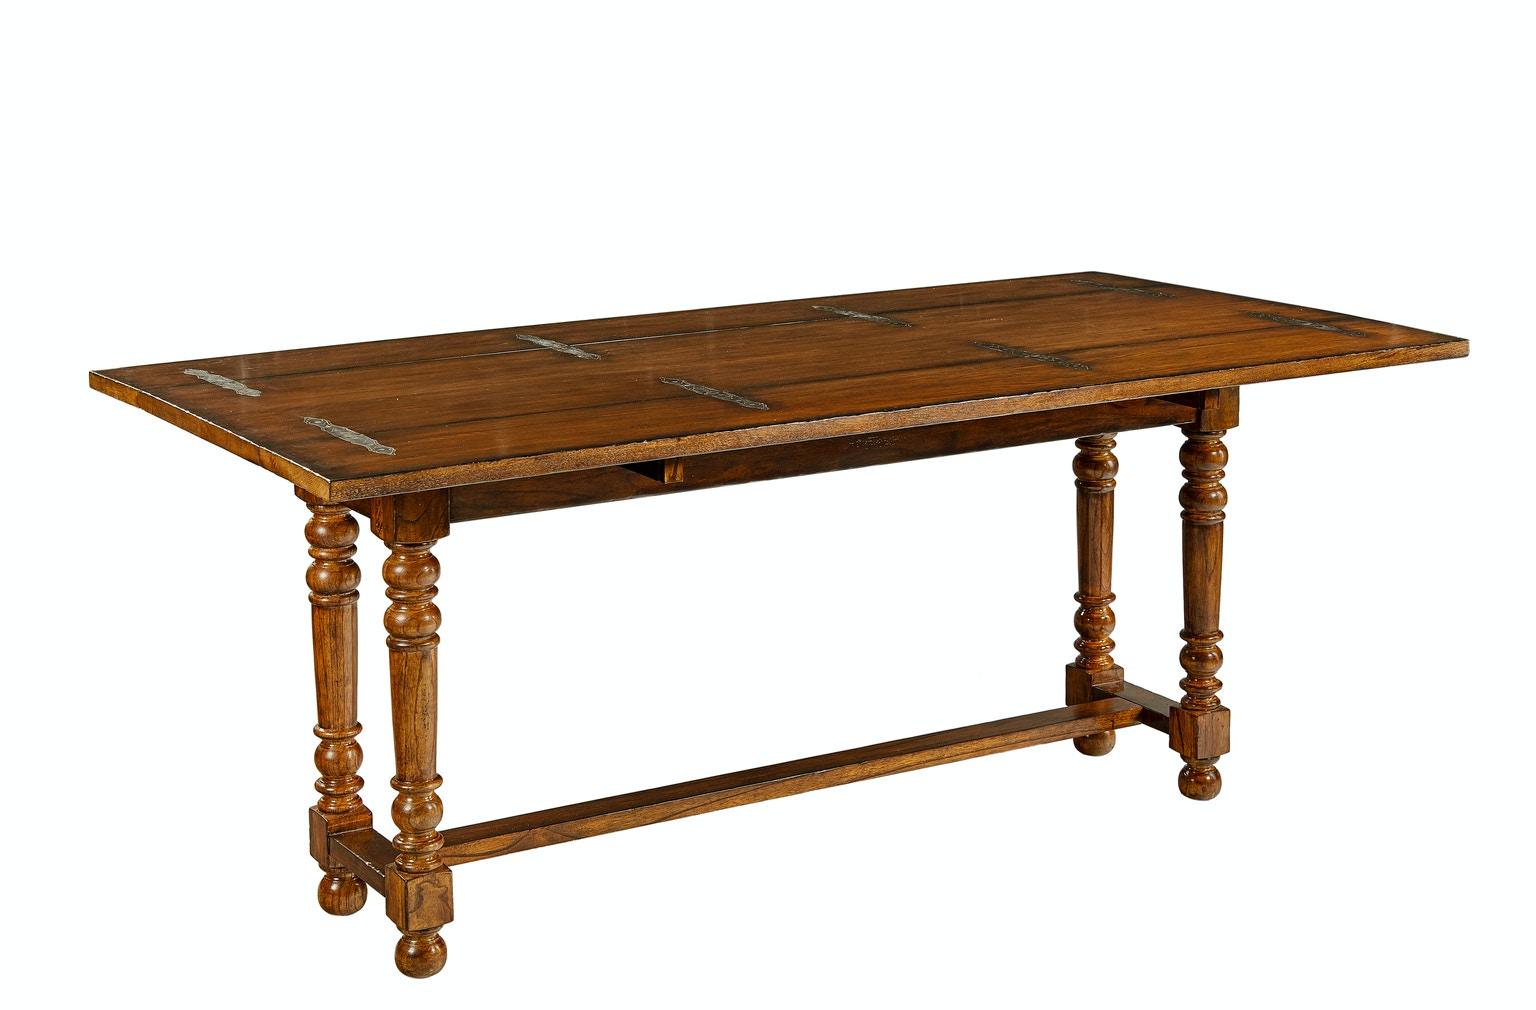 Furniture Classics Bellmore Drop Leaf Table 7465AC91